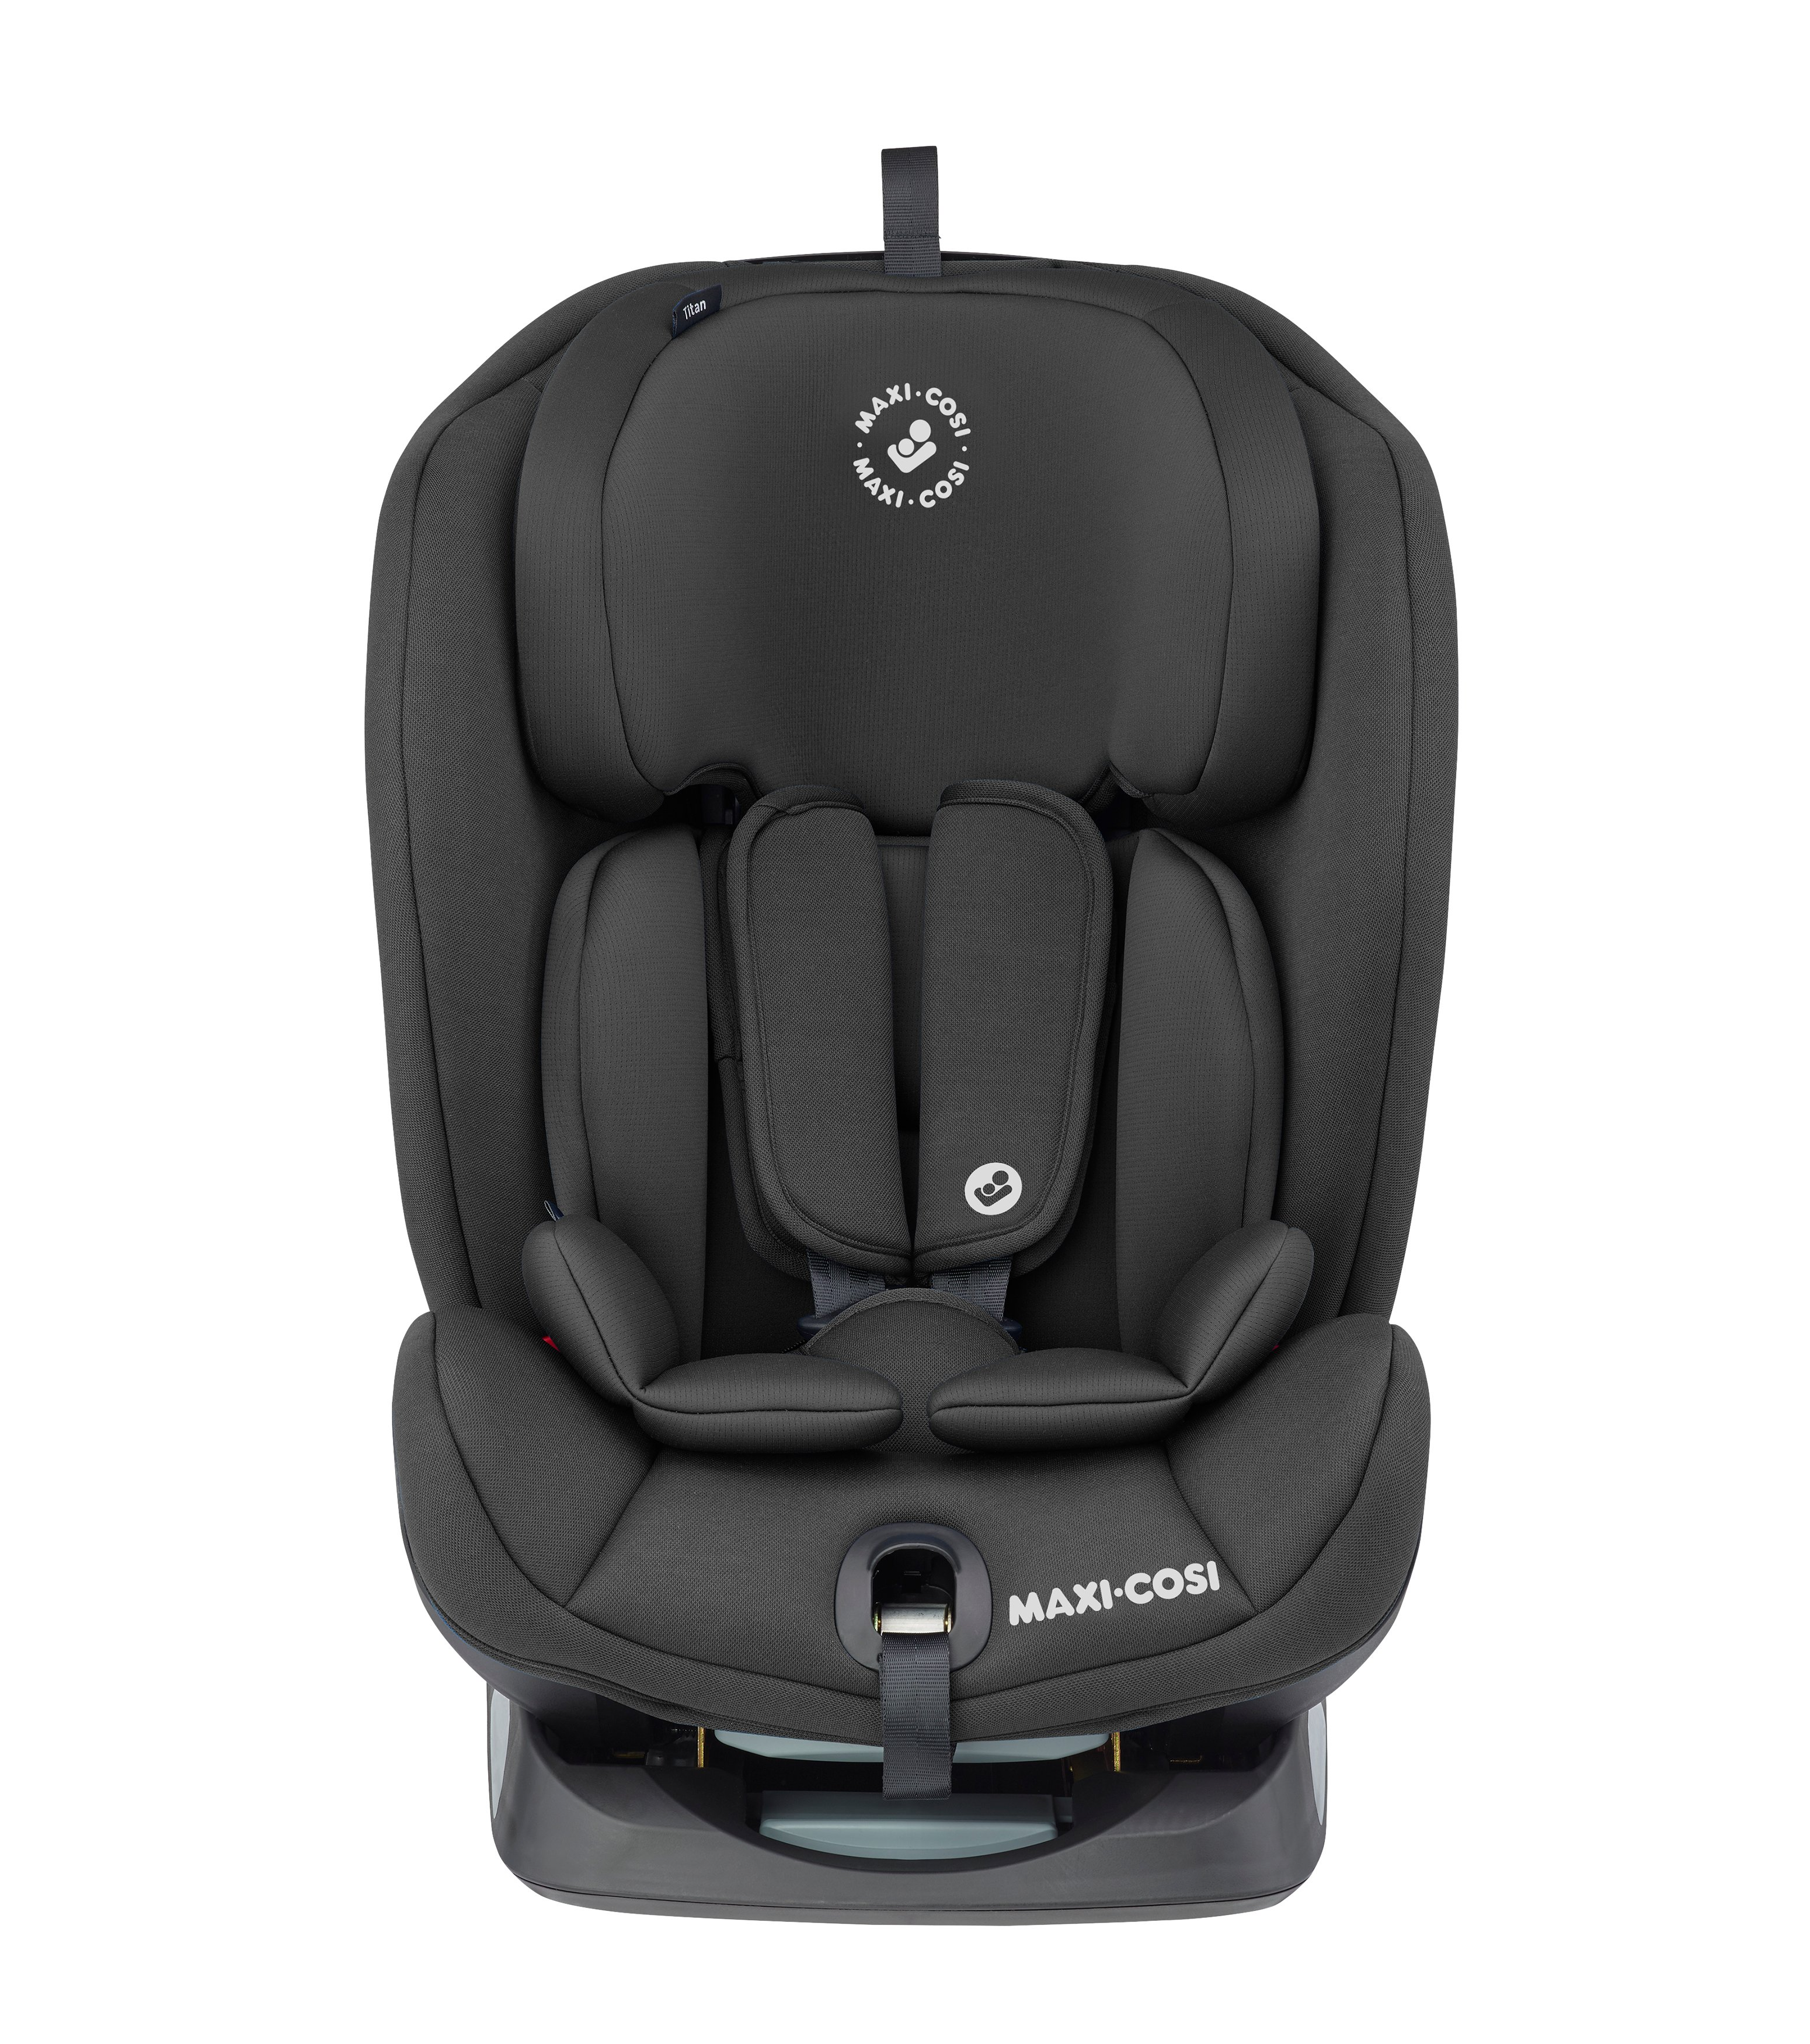 Maxi-Cosi Titan 9-36 Kg Basic Black